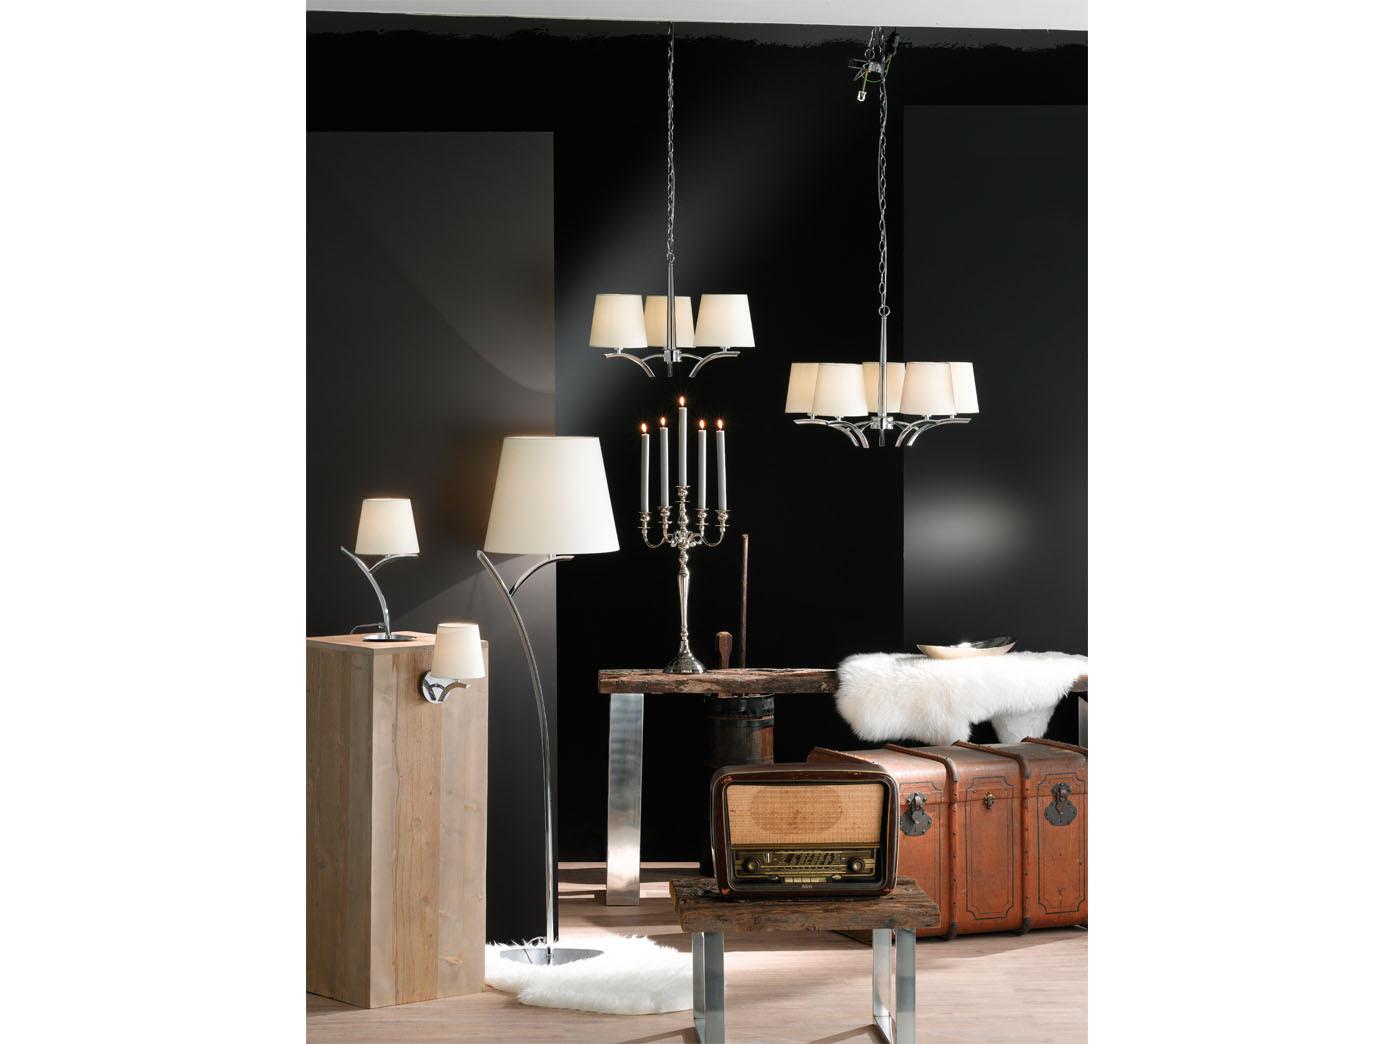 HONSEL Design Stelo Luce Luce Luce y moderno, cromo tessuto bianco, Piantana Luce Salotto Lampada ca336c